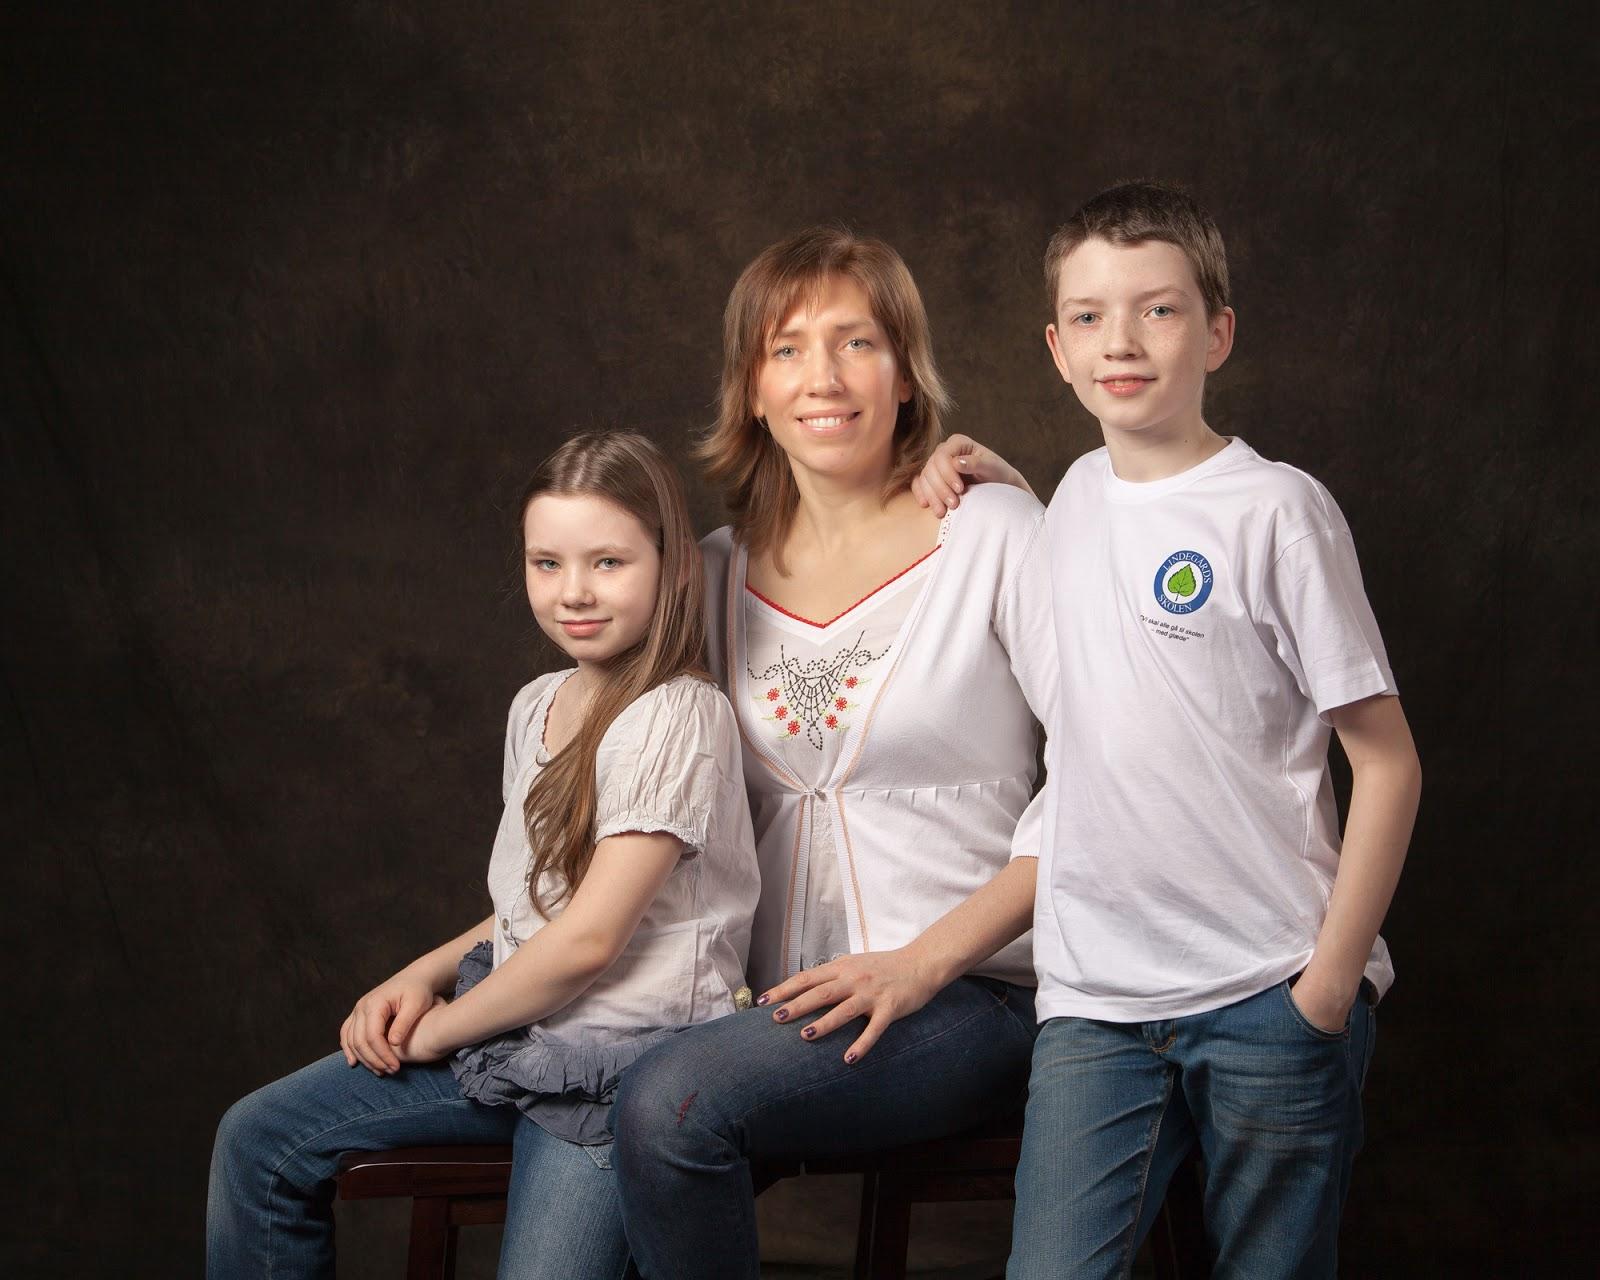 Family Graduation Studio Portrait Price List Family portrait photography price list